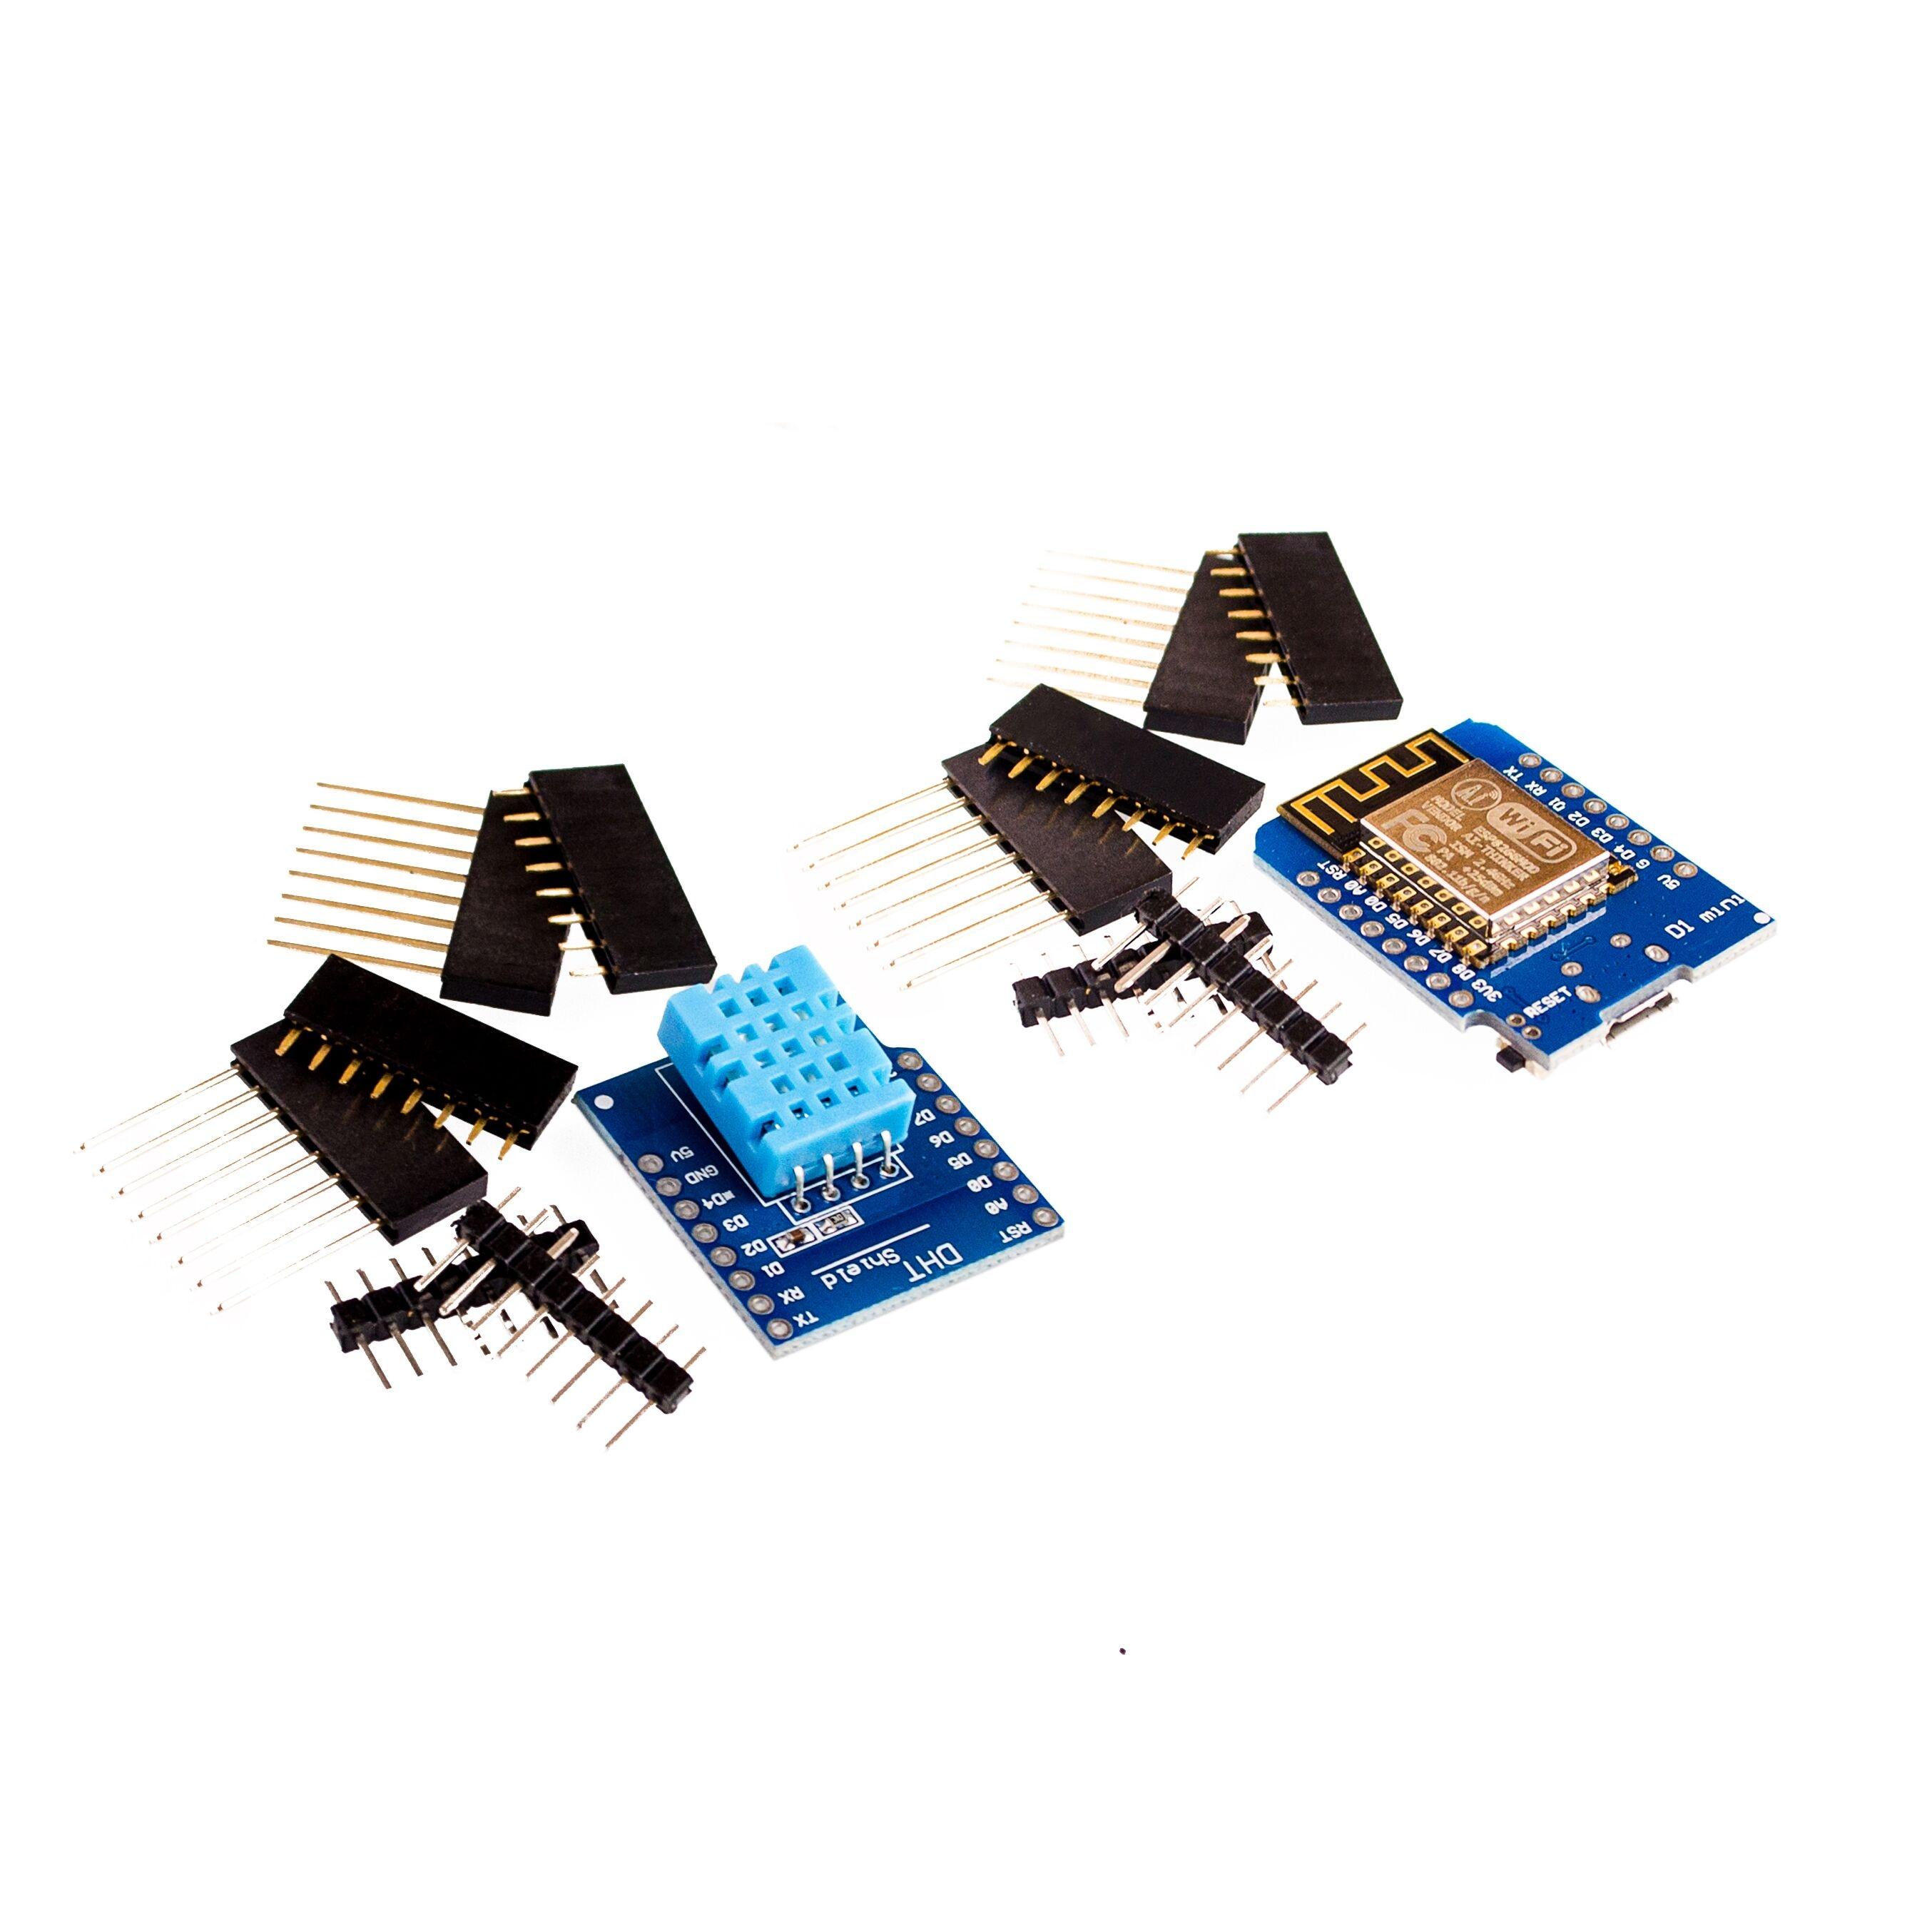 10pcs Lot Electronics Ics Chips Lm358n Lm358 358 Linear Lm358p Sop8 Integrated Circuits Dual Operational Amplifiers Usb Wemos D1 Mini Wifi Development Board Nodemcu Lua Iot Dht Shield